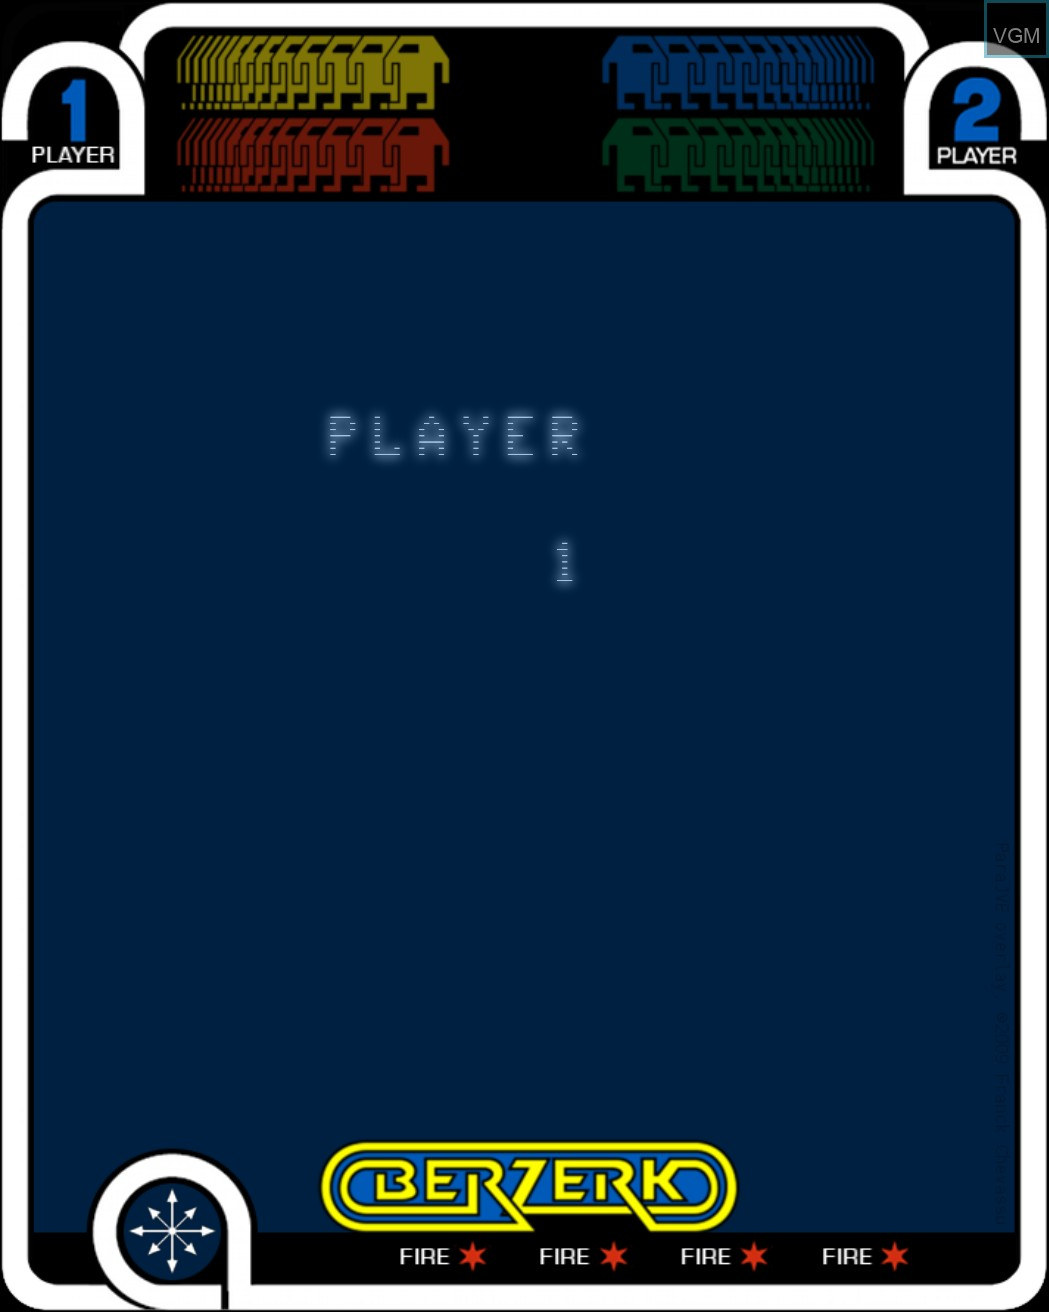 Image du menu du jeu Berzerk sur MB Vectrex